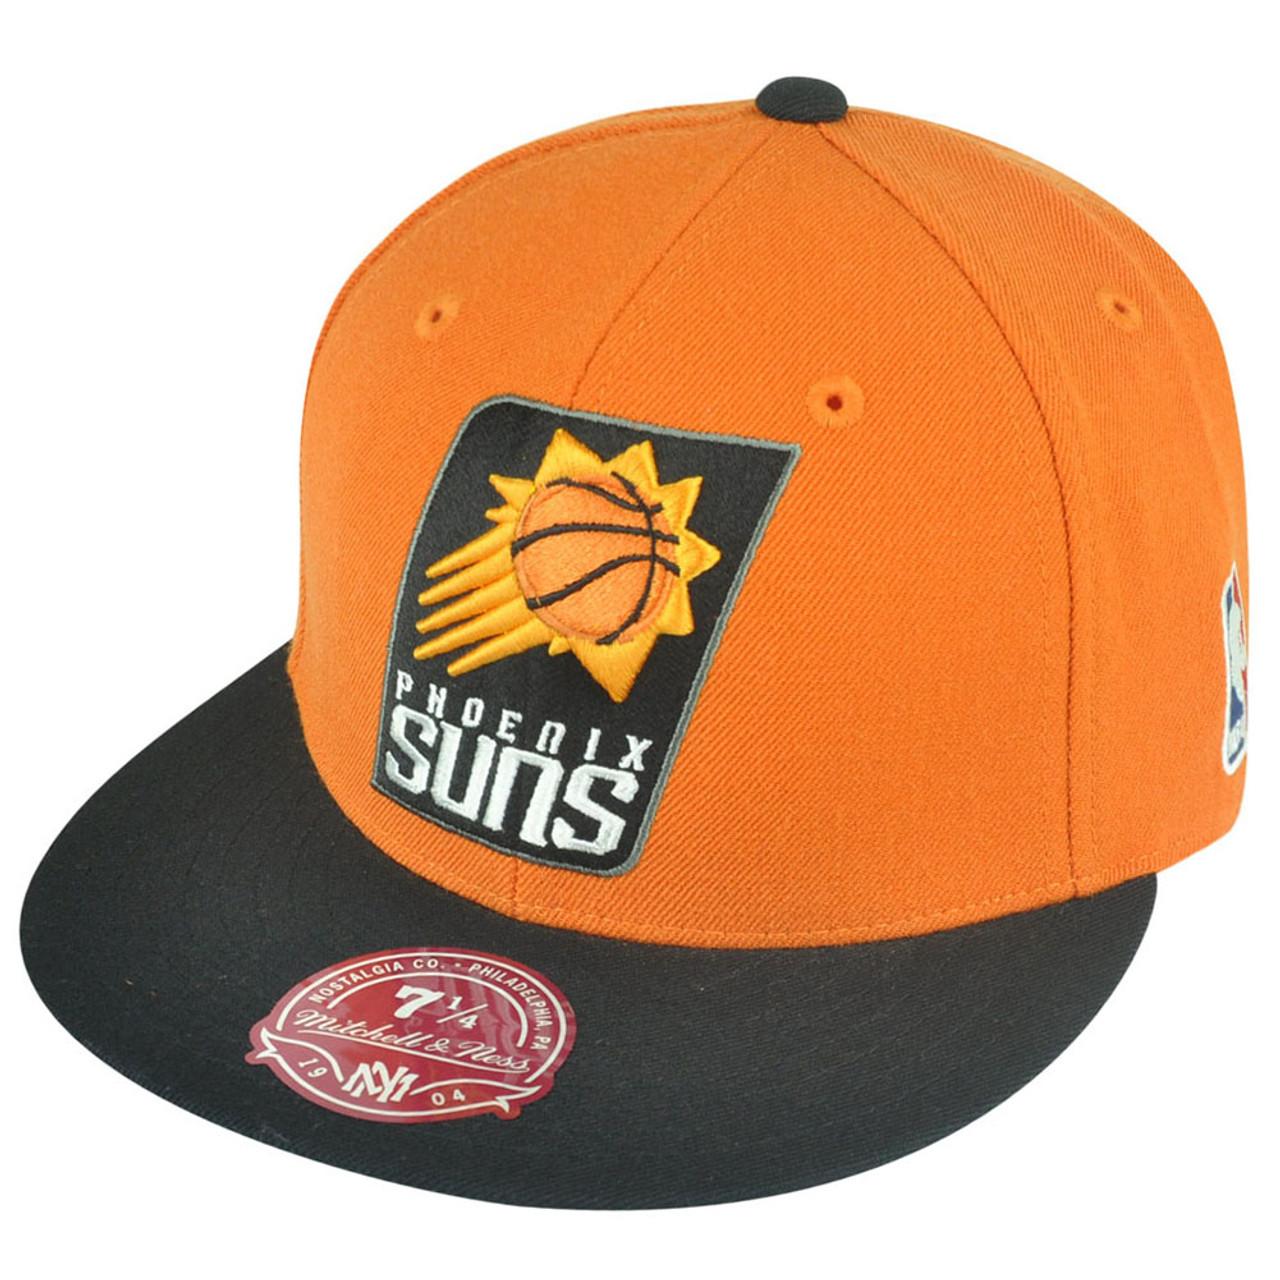 finest selection 4b072 6006c NBA Mitchell Ness Phoenix Suns G098 XL Logo 2-Tone Fitted Orange Hat Cap -  Cap Store Online.com